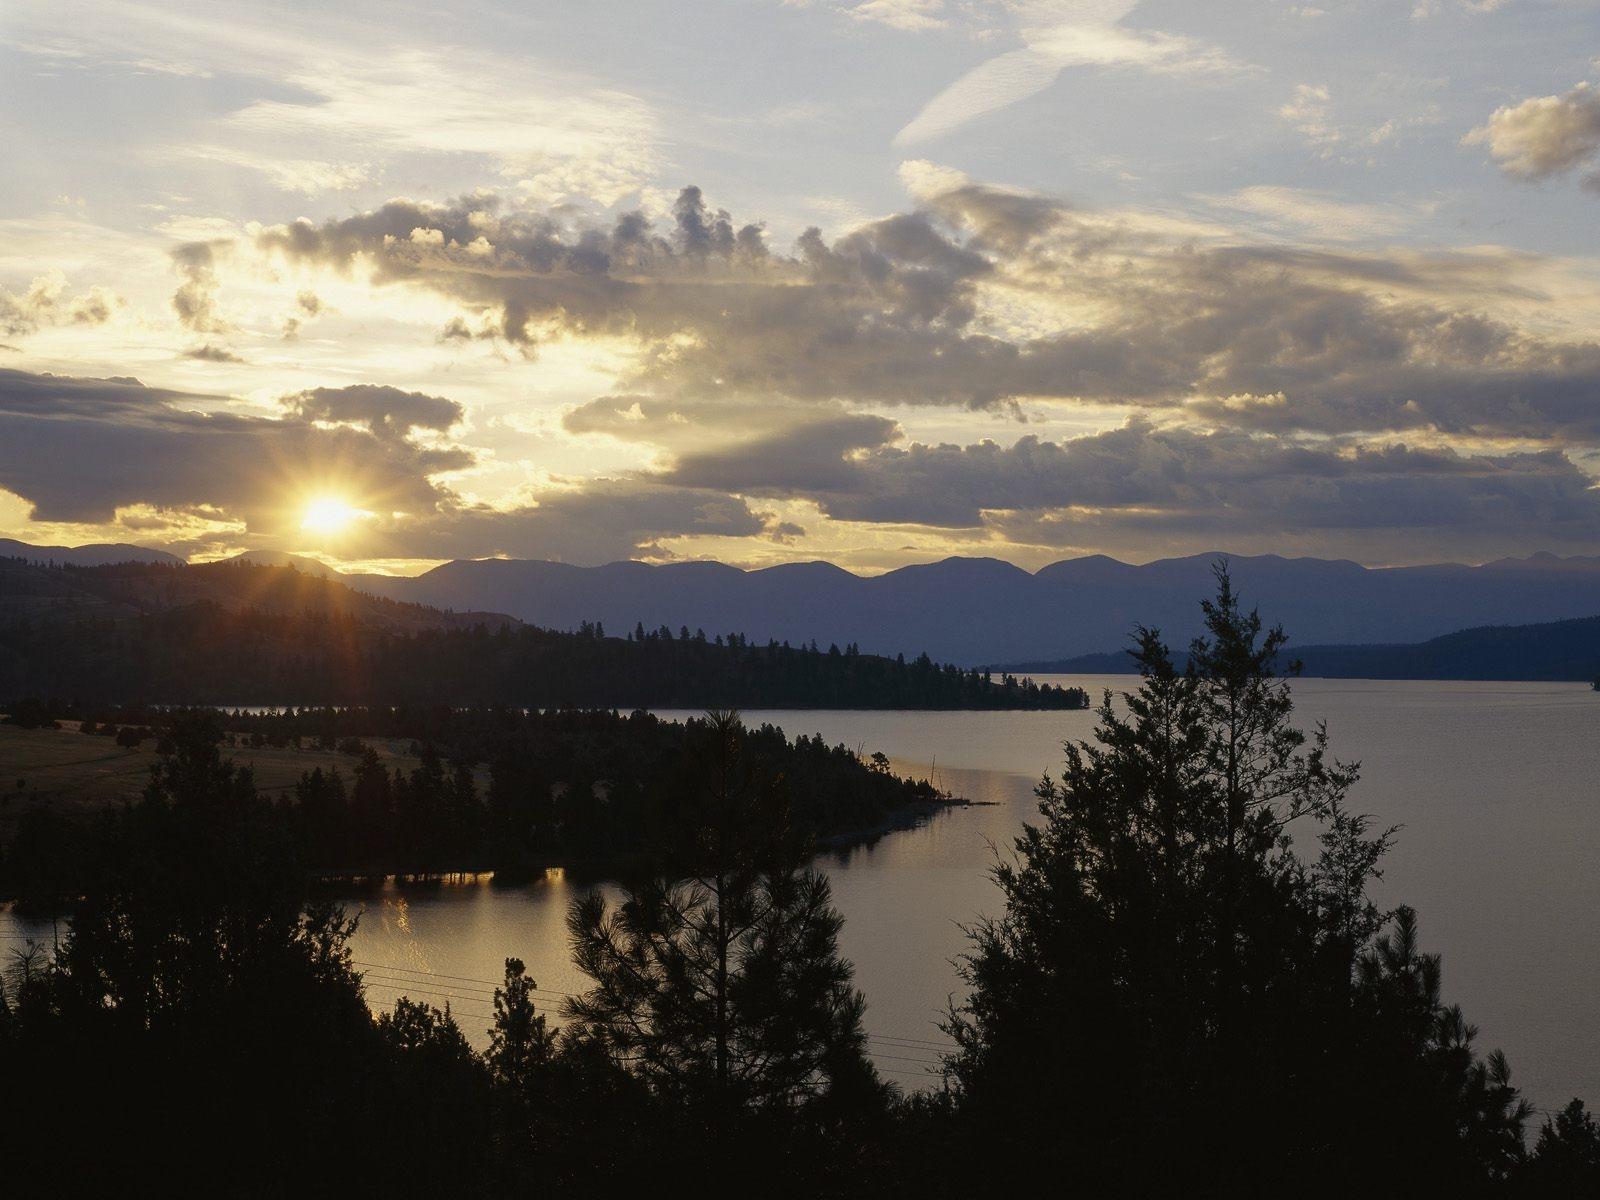 Wallpaper Sunlight Trees Sunset Sea Nature Reflection Sky Sunrise Evening Morning River Sun Horizon Dusk Montana Cloud Mountain Dawn